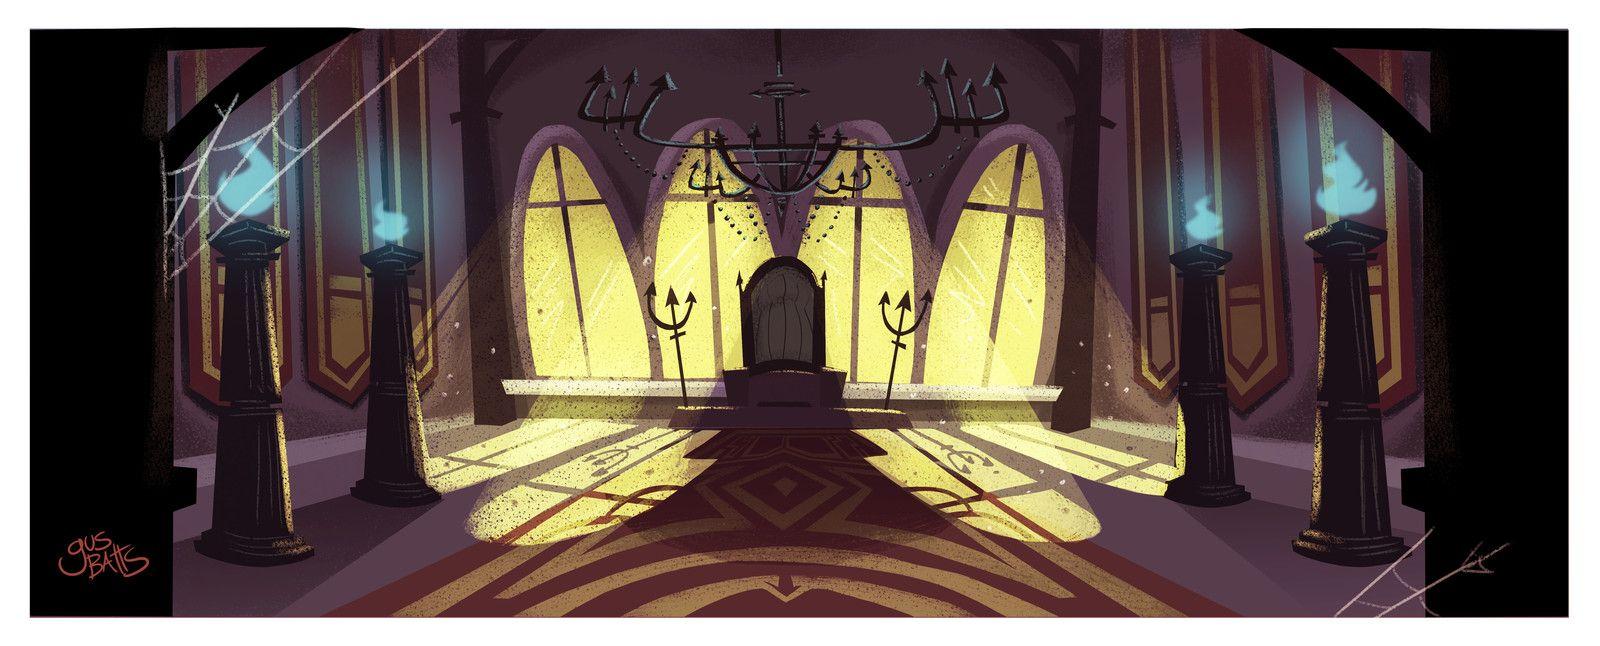 Tv Show pitch background design, Gus Batts on ArtStation at https://www.artstation.com/artwork/wPYkL